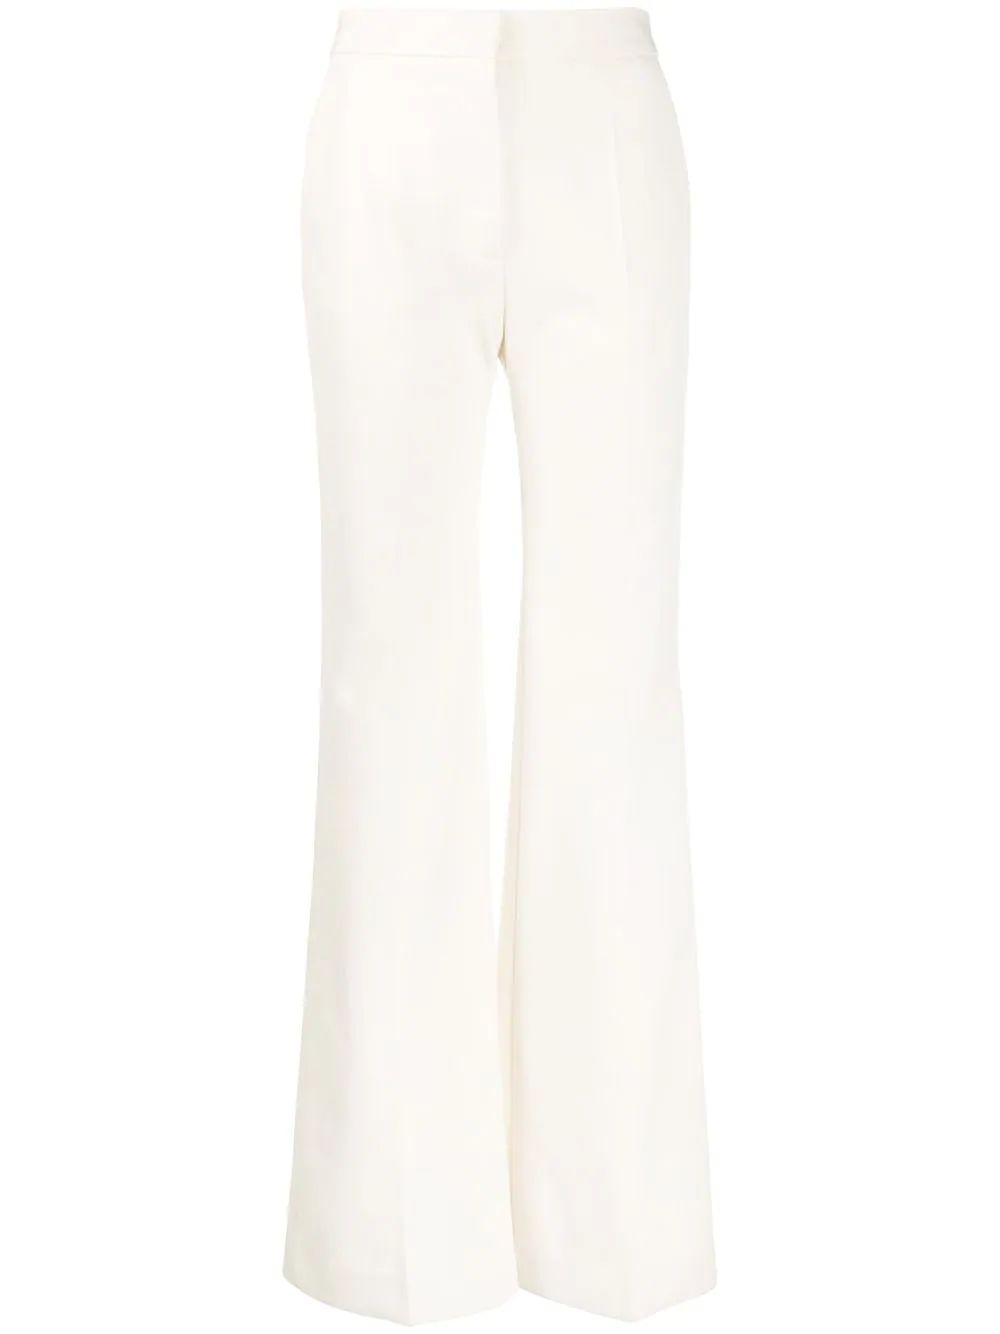 High Waist Victoria Trouser Item # 2220WTR000947B